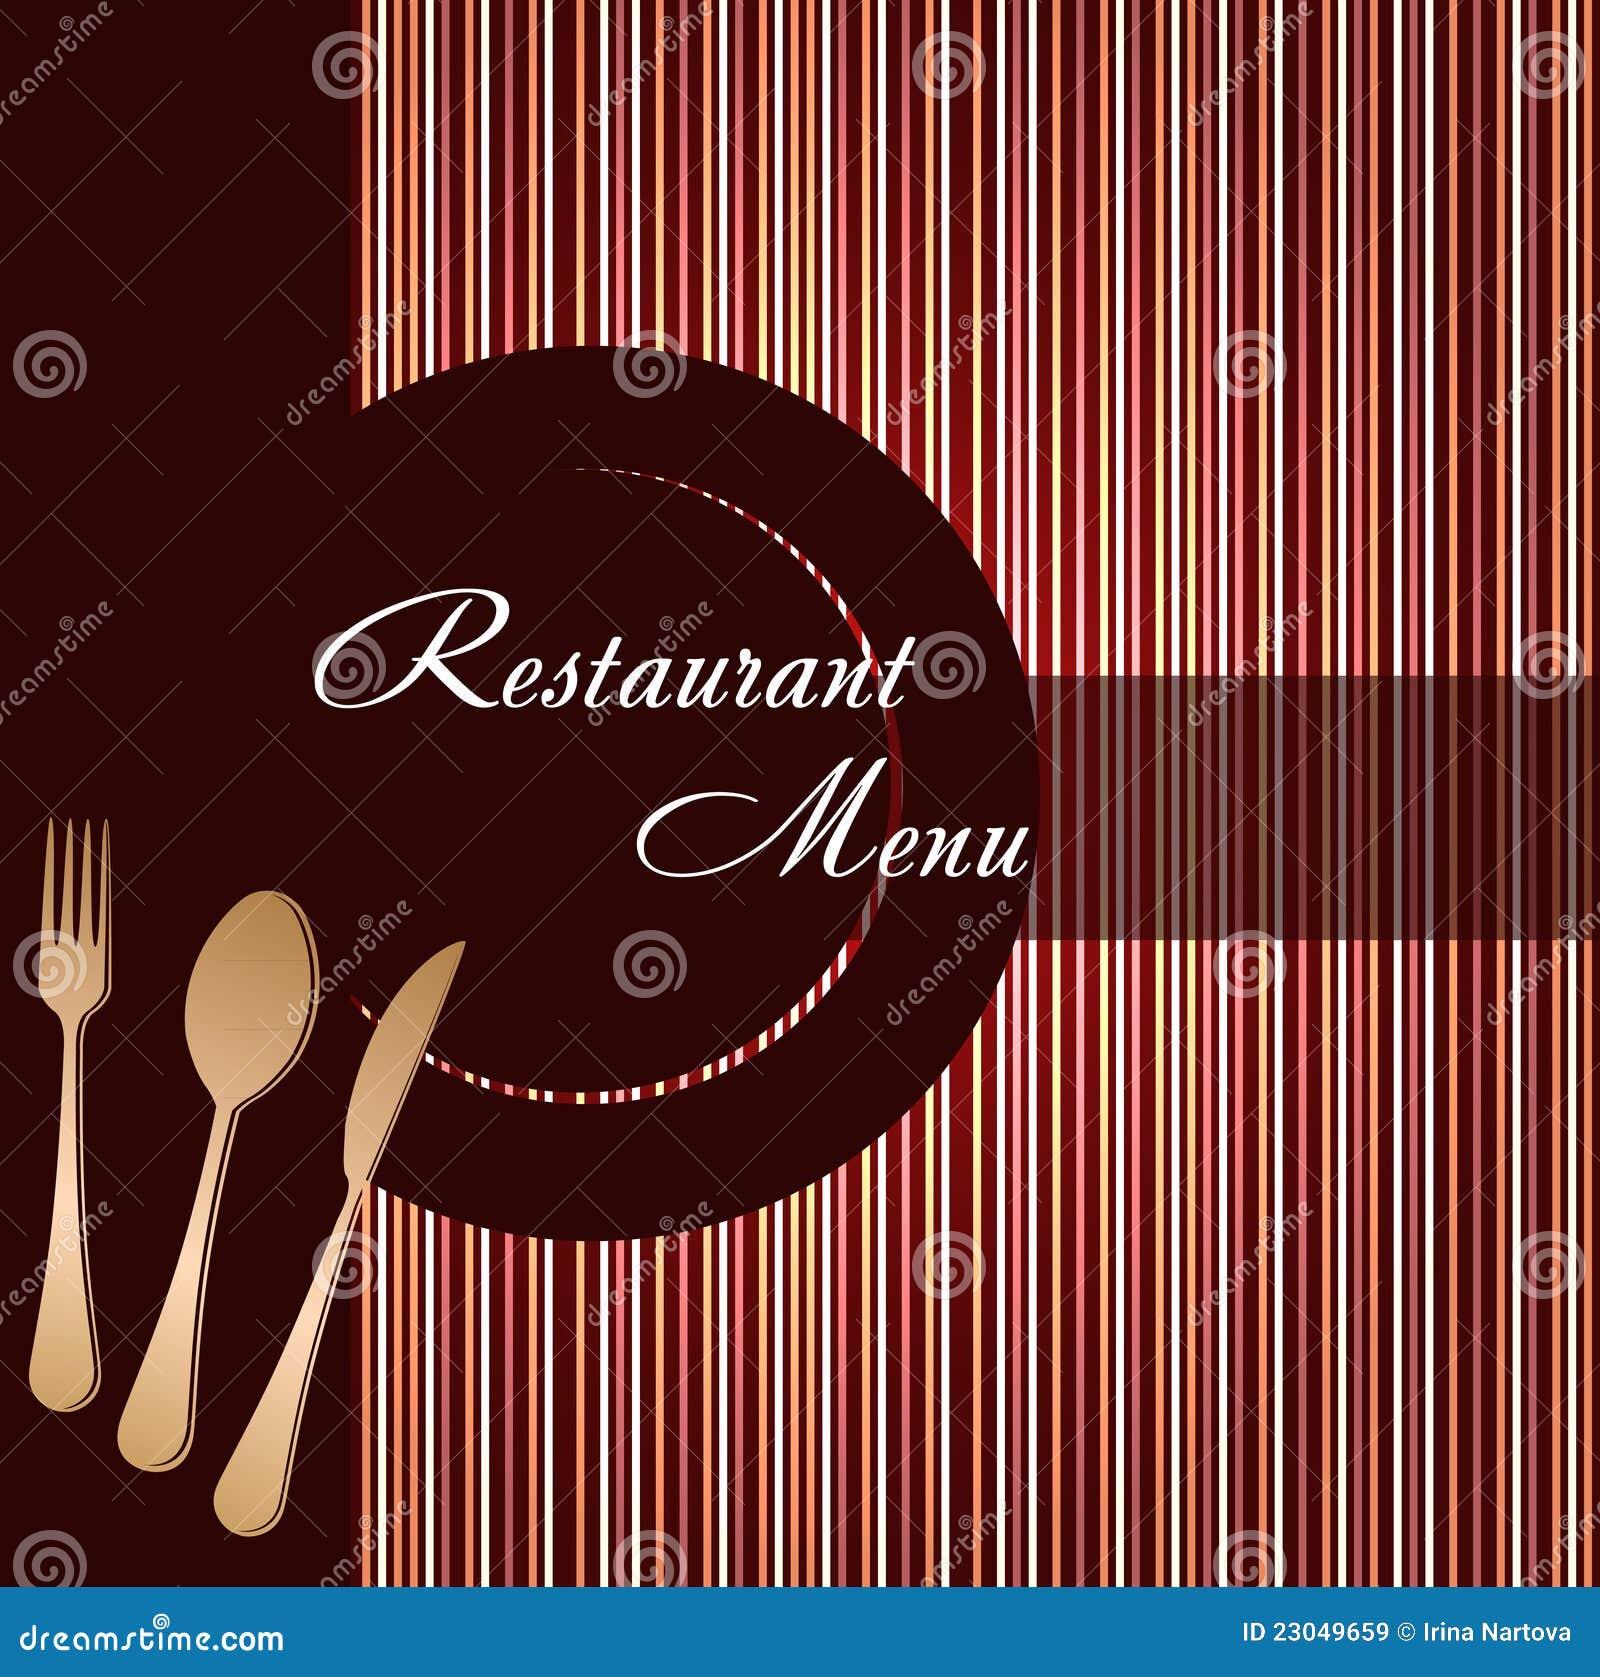 шаблон меню для ресторана или кафе